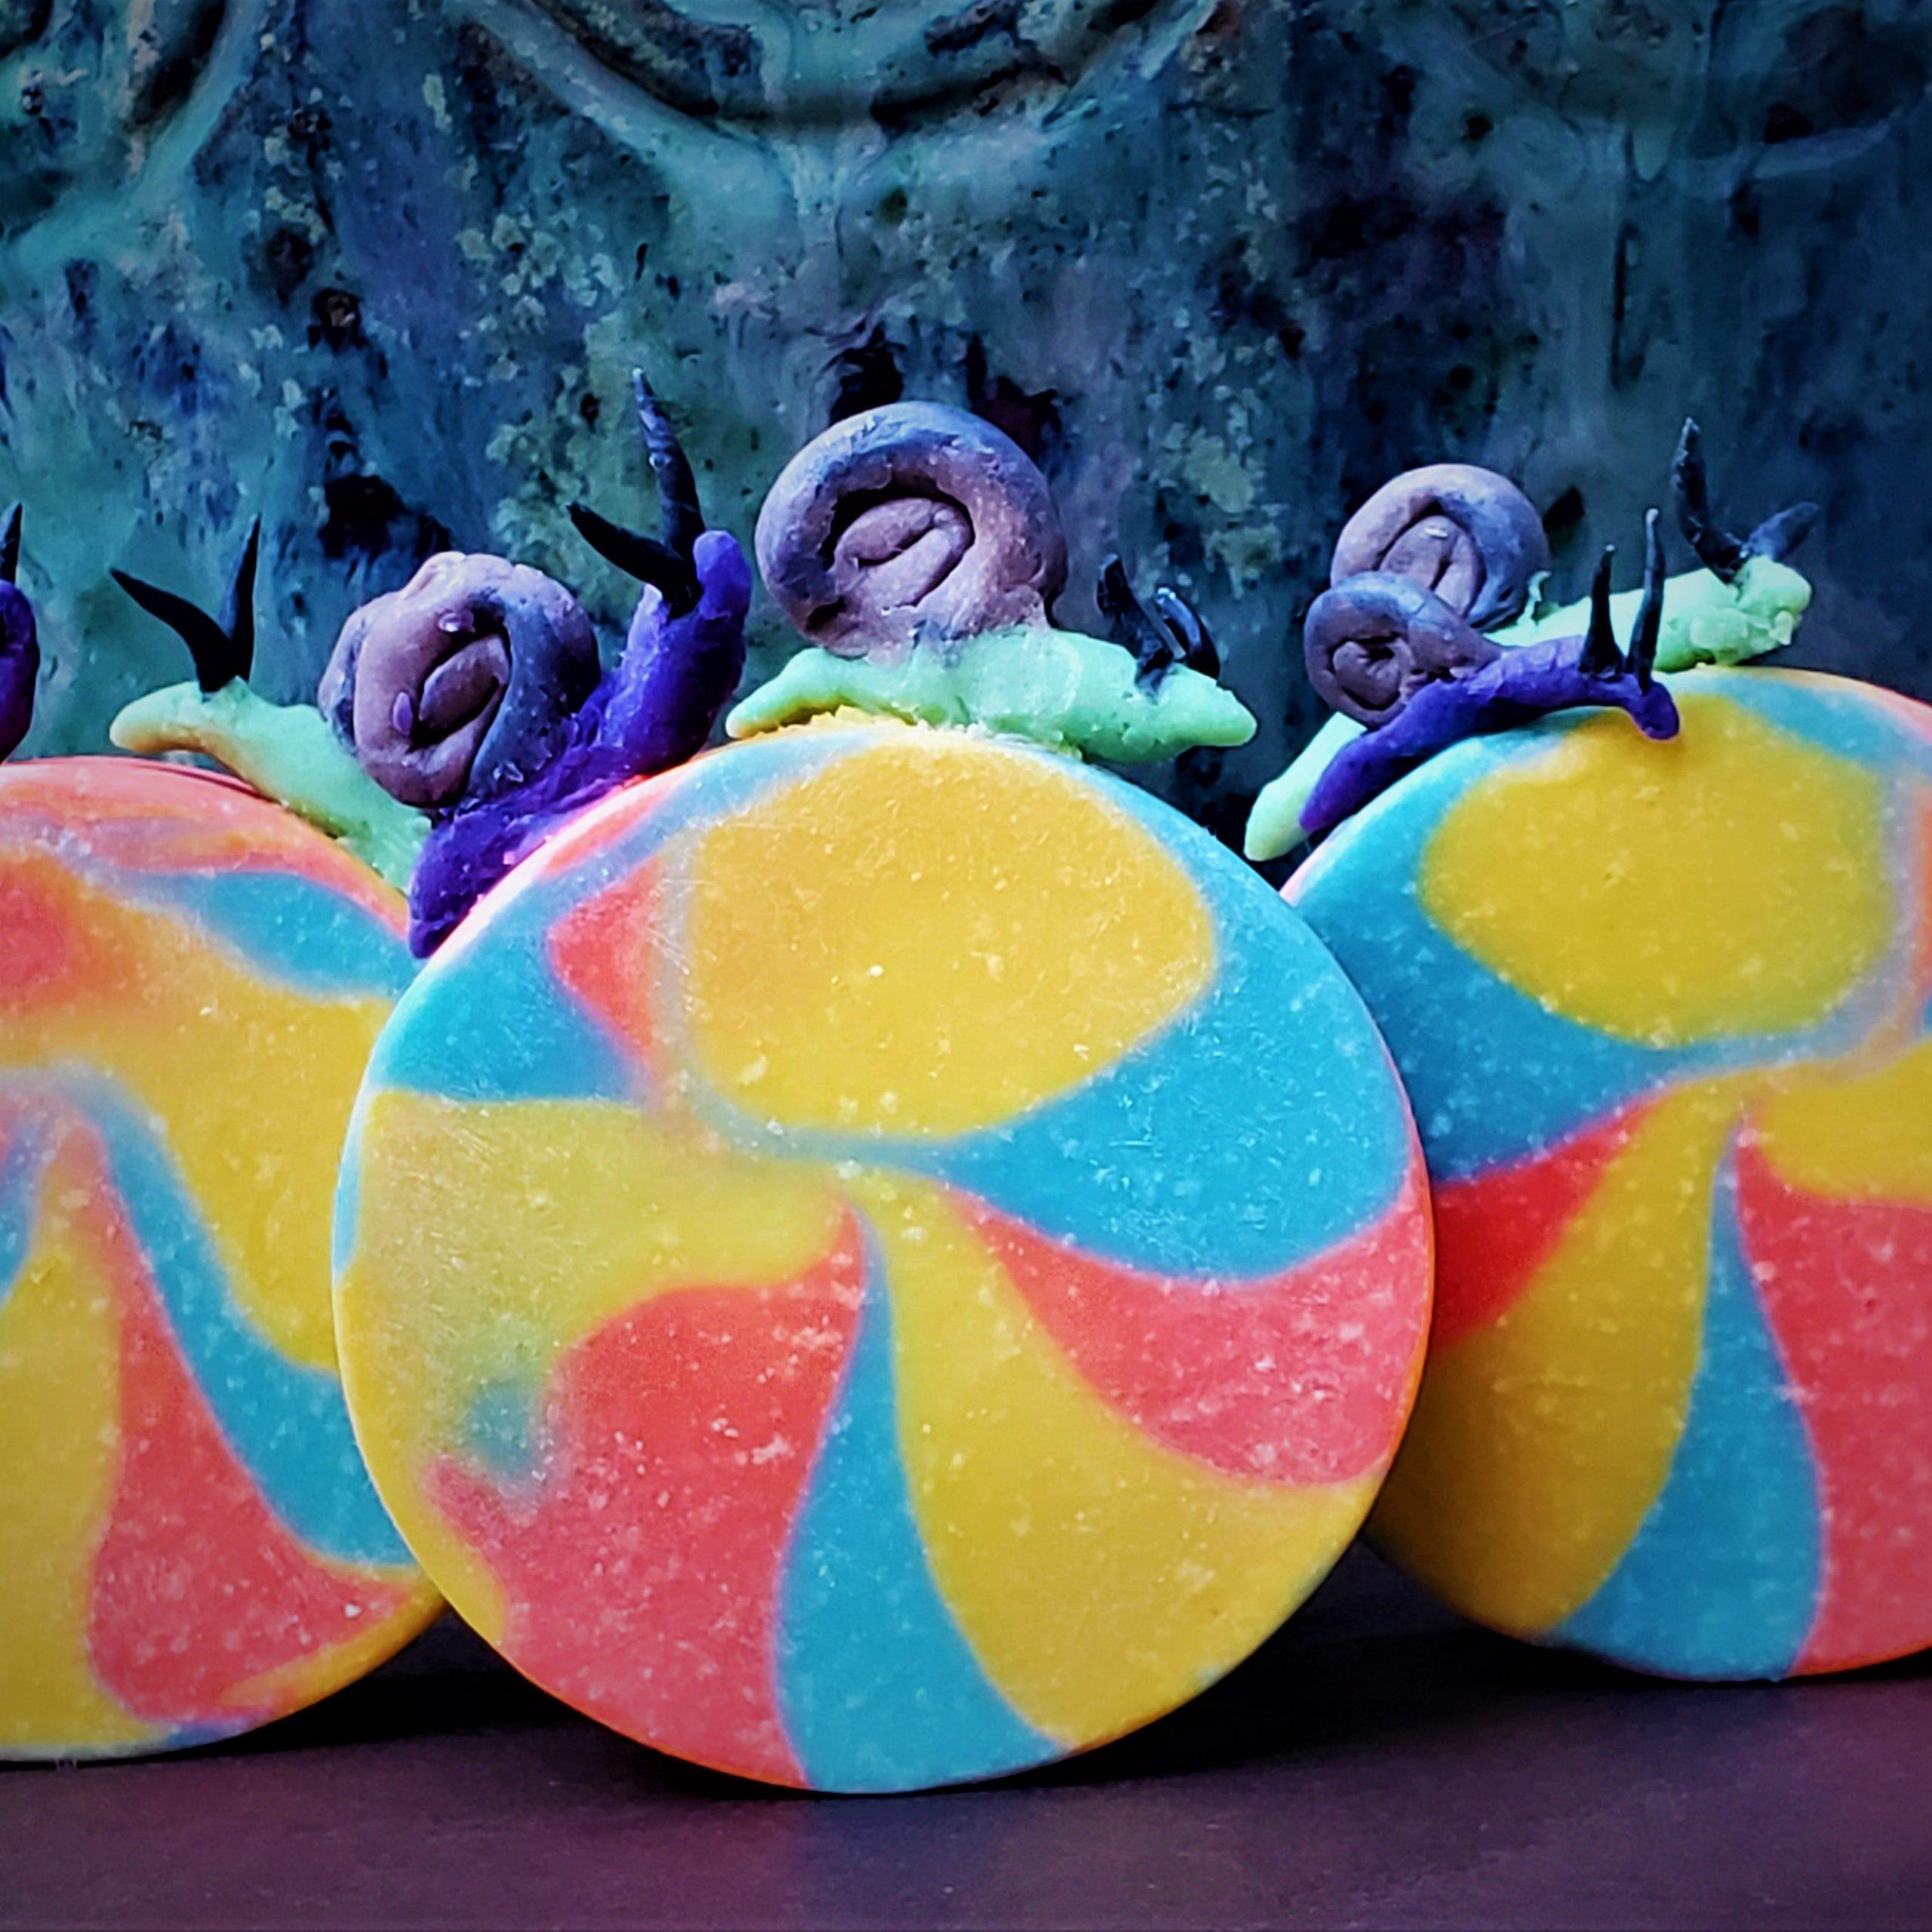 psychedelic snail